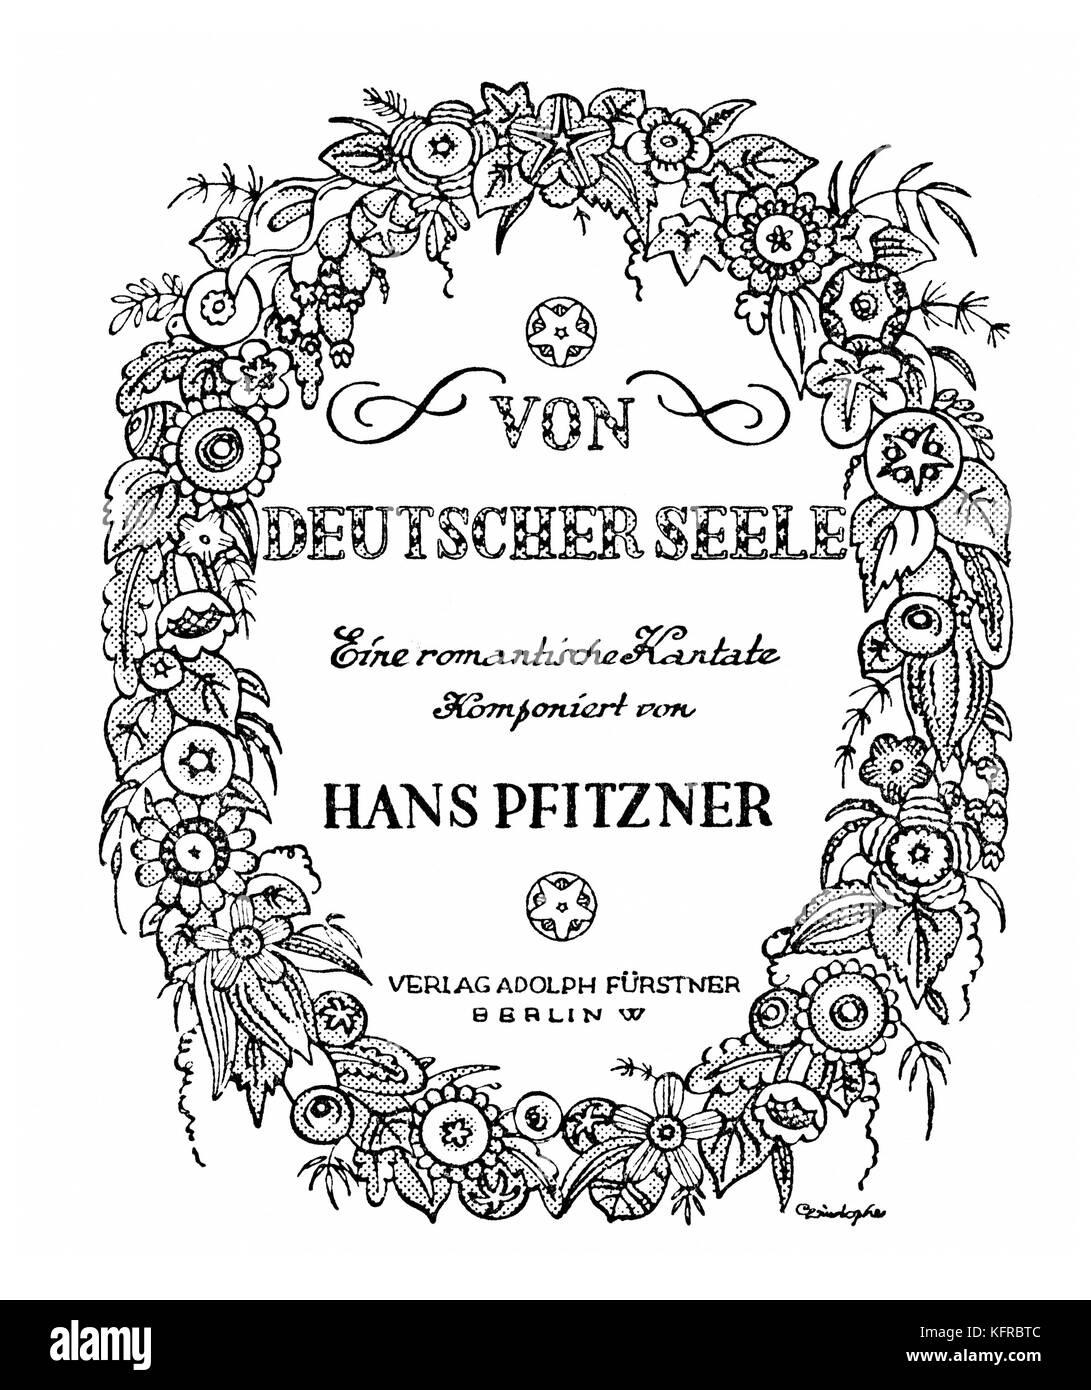 Hans Pfitzner 's cantata 'Von deutscher Seele' - score cover illustration. German composer, 5 May 1869 - Stock Image